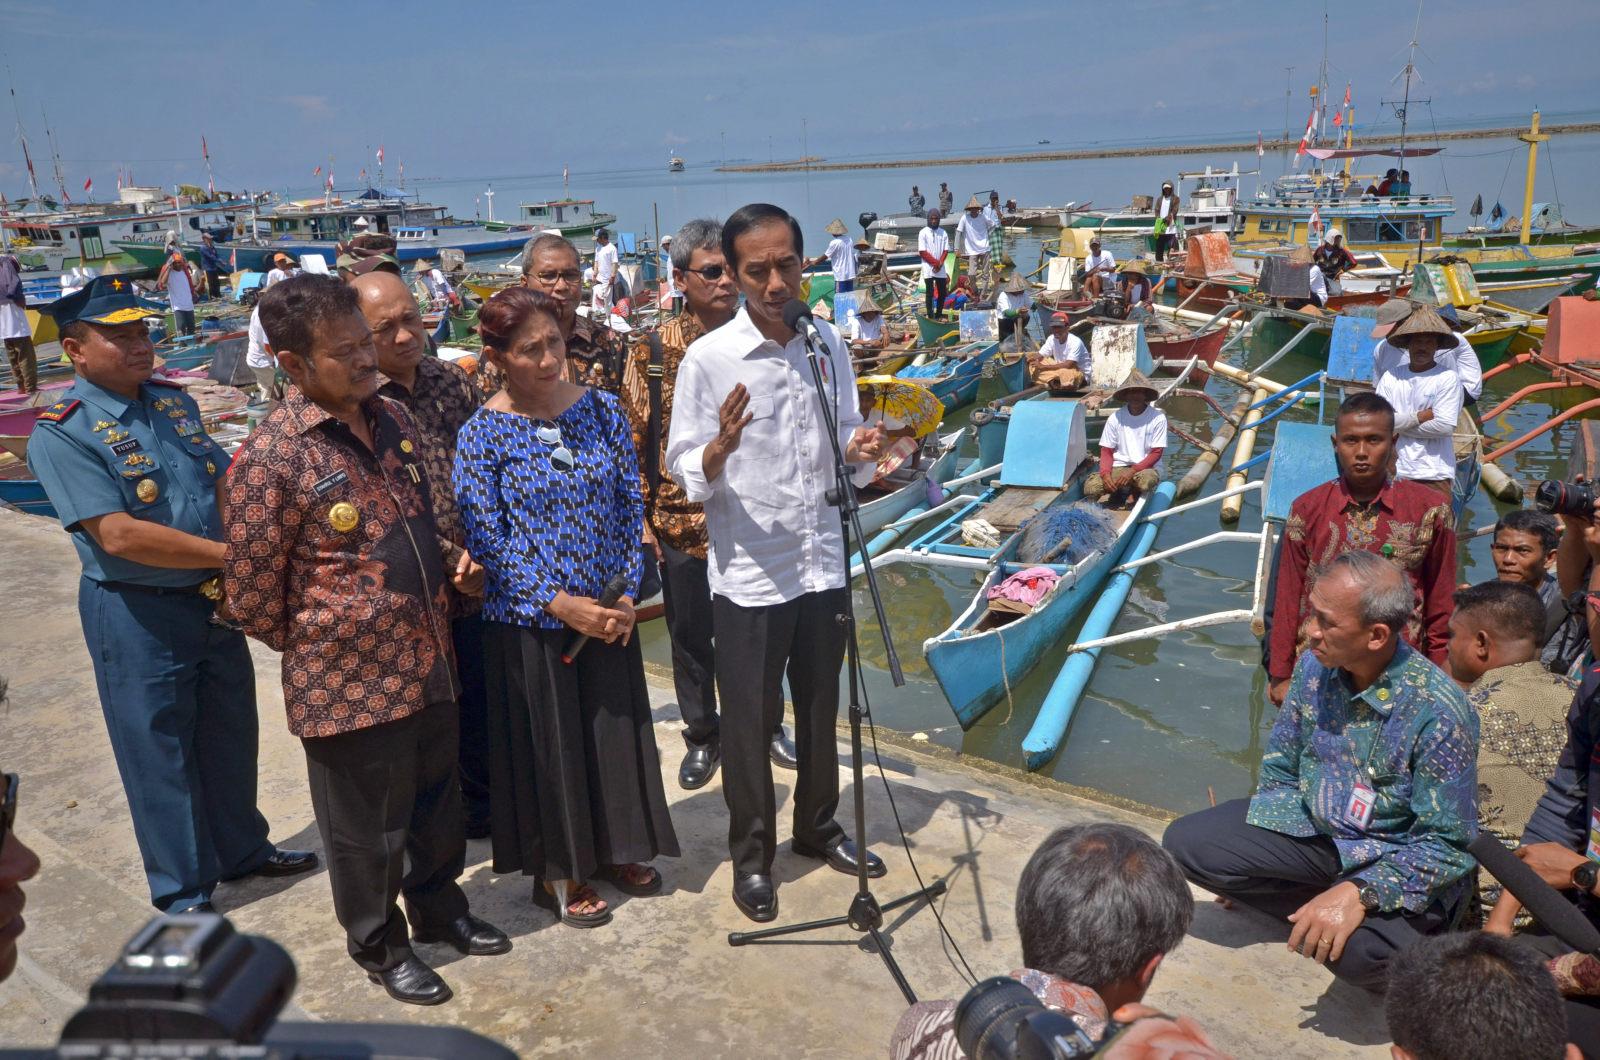 Jokowi Pilih Tinjau Proyek Saat Demo 2 Desember